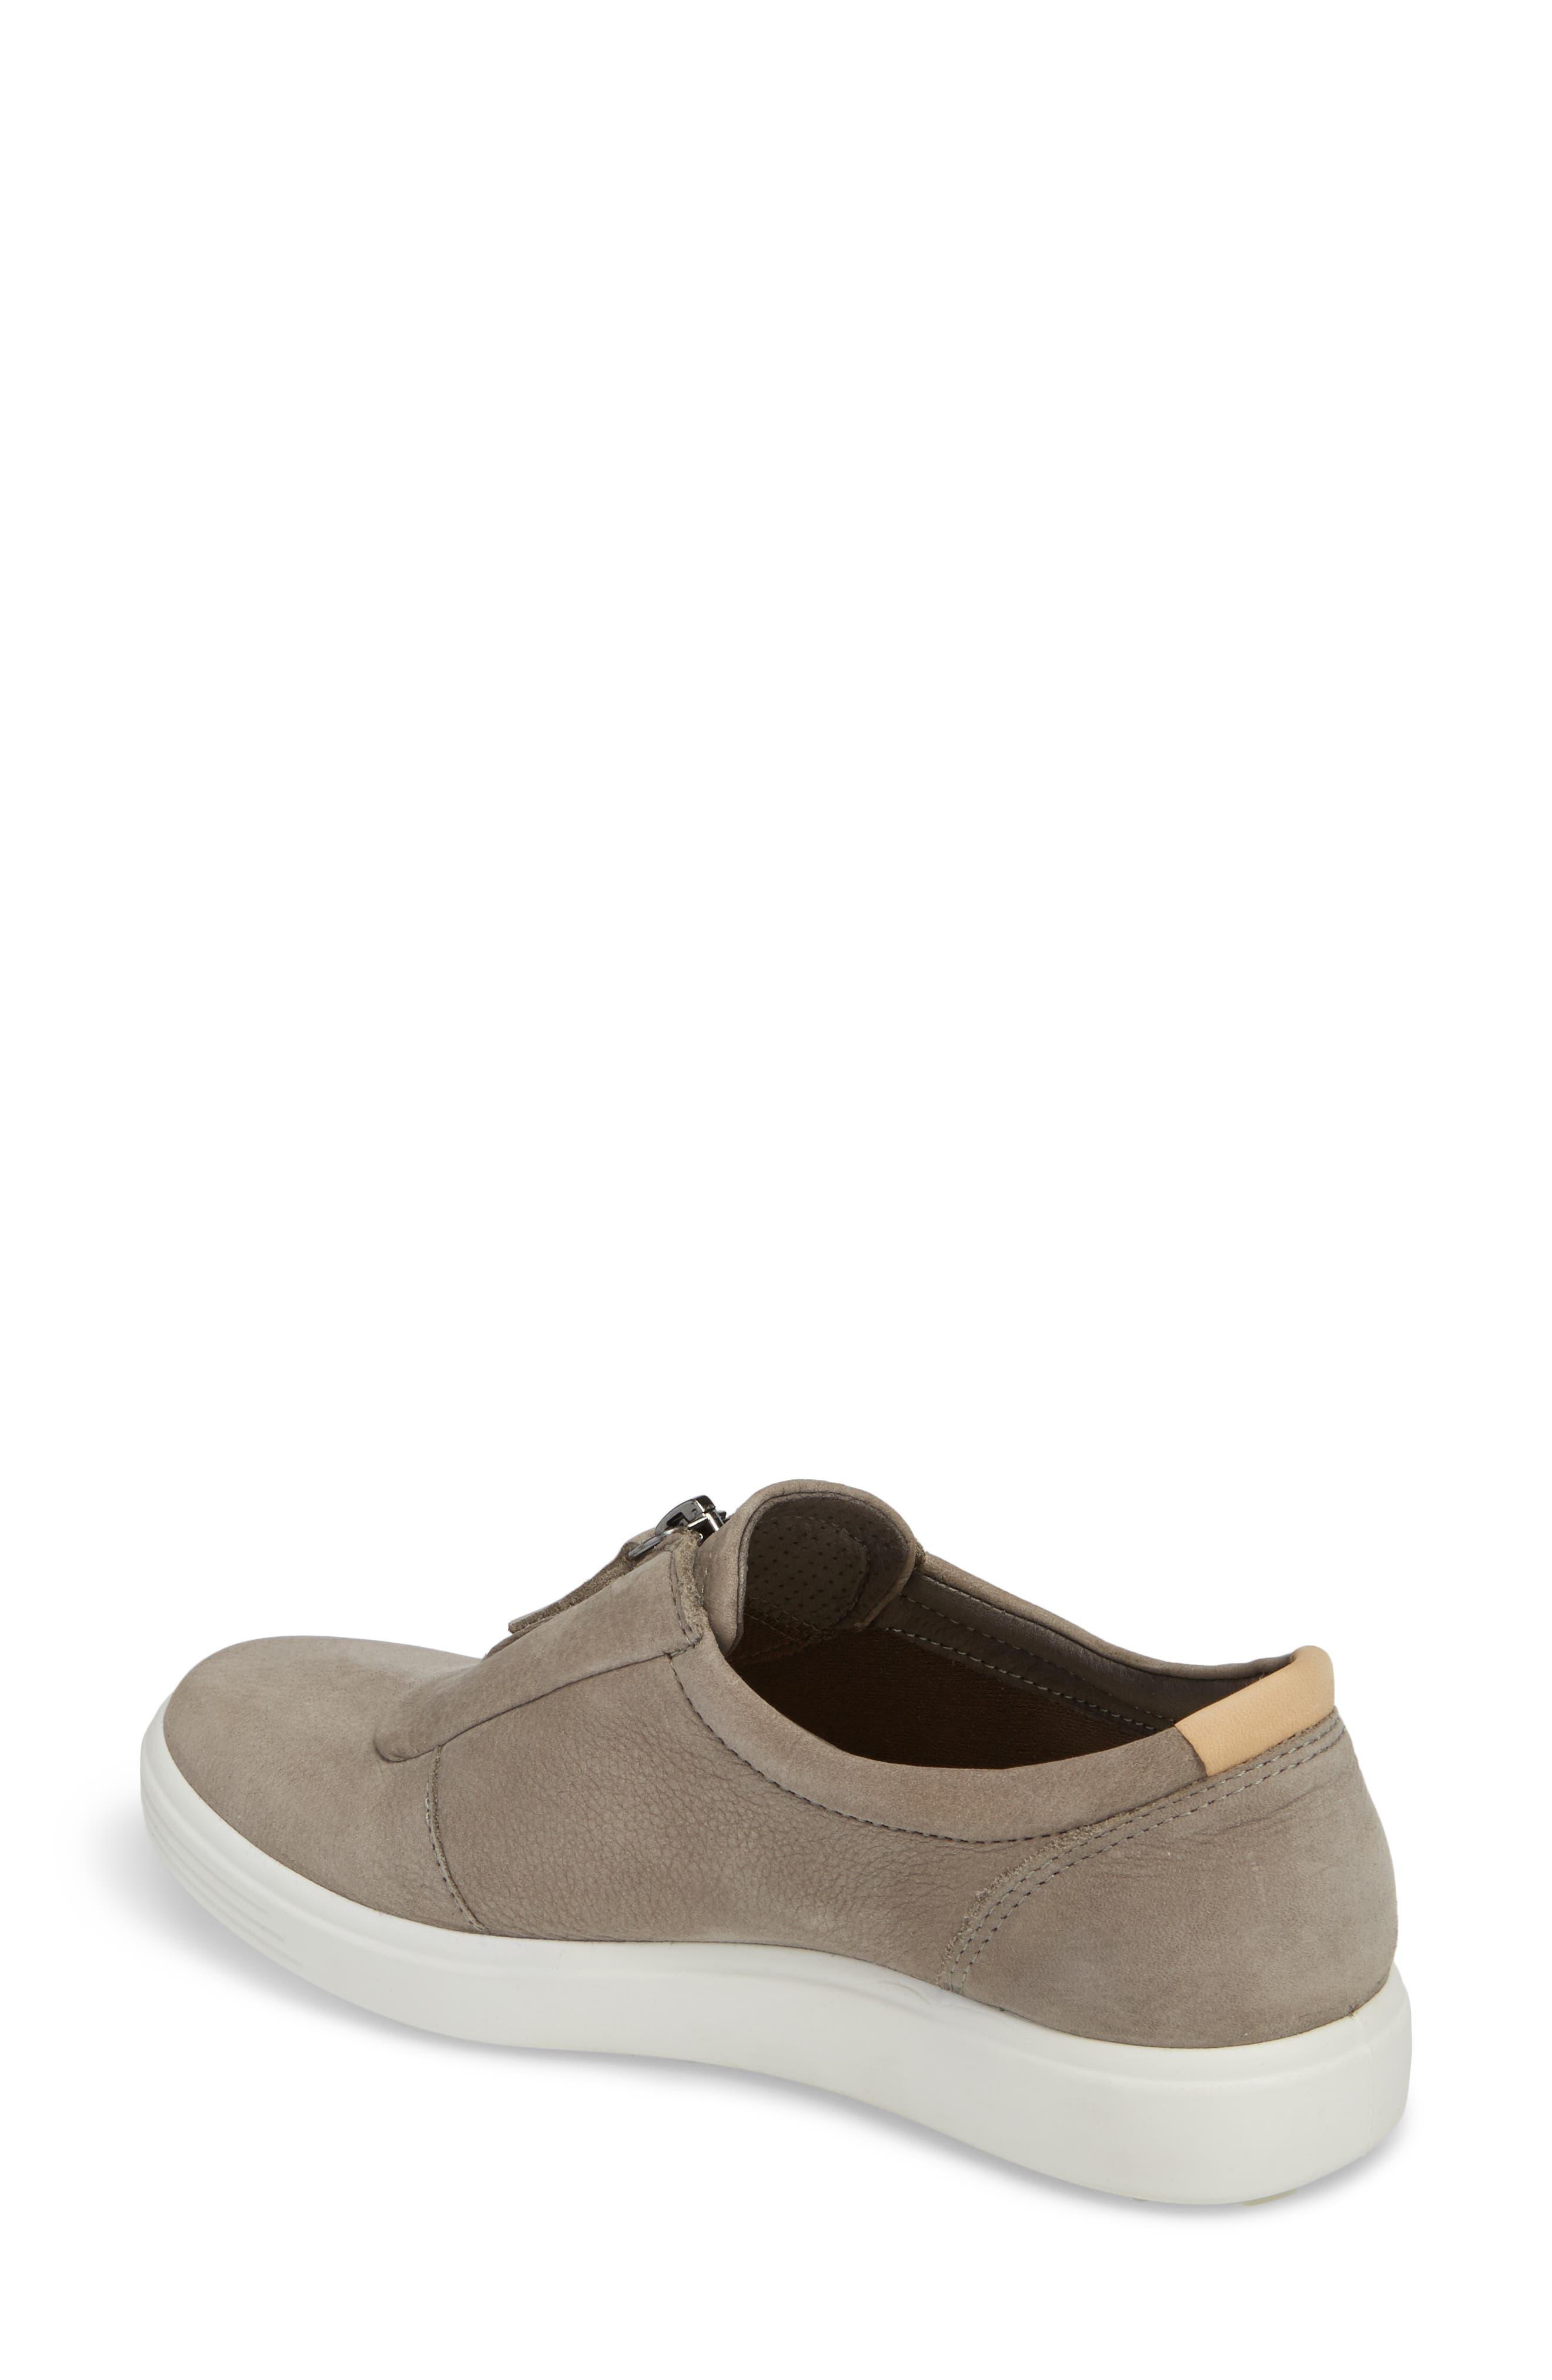 Soft 7 Slip-On Sneaker,                             Alternate thumbnail 2, color,                             WARM GREY LEATHER